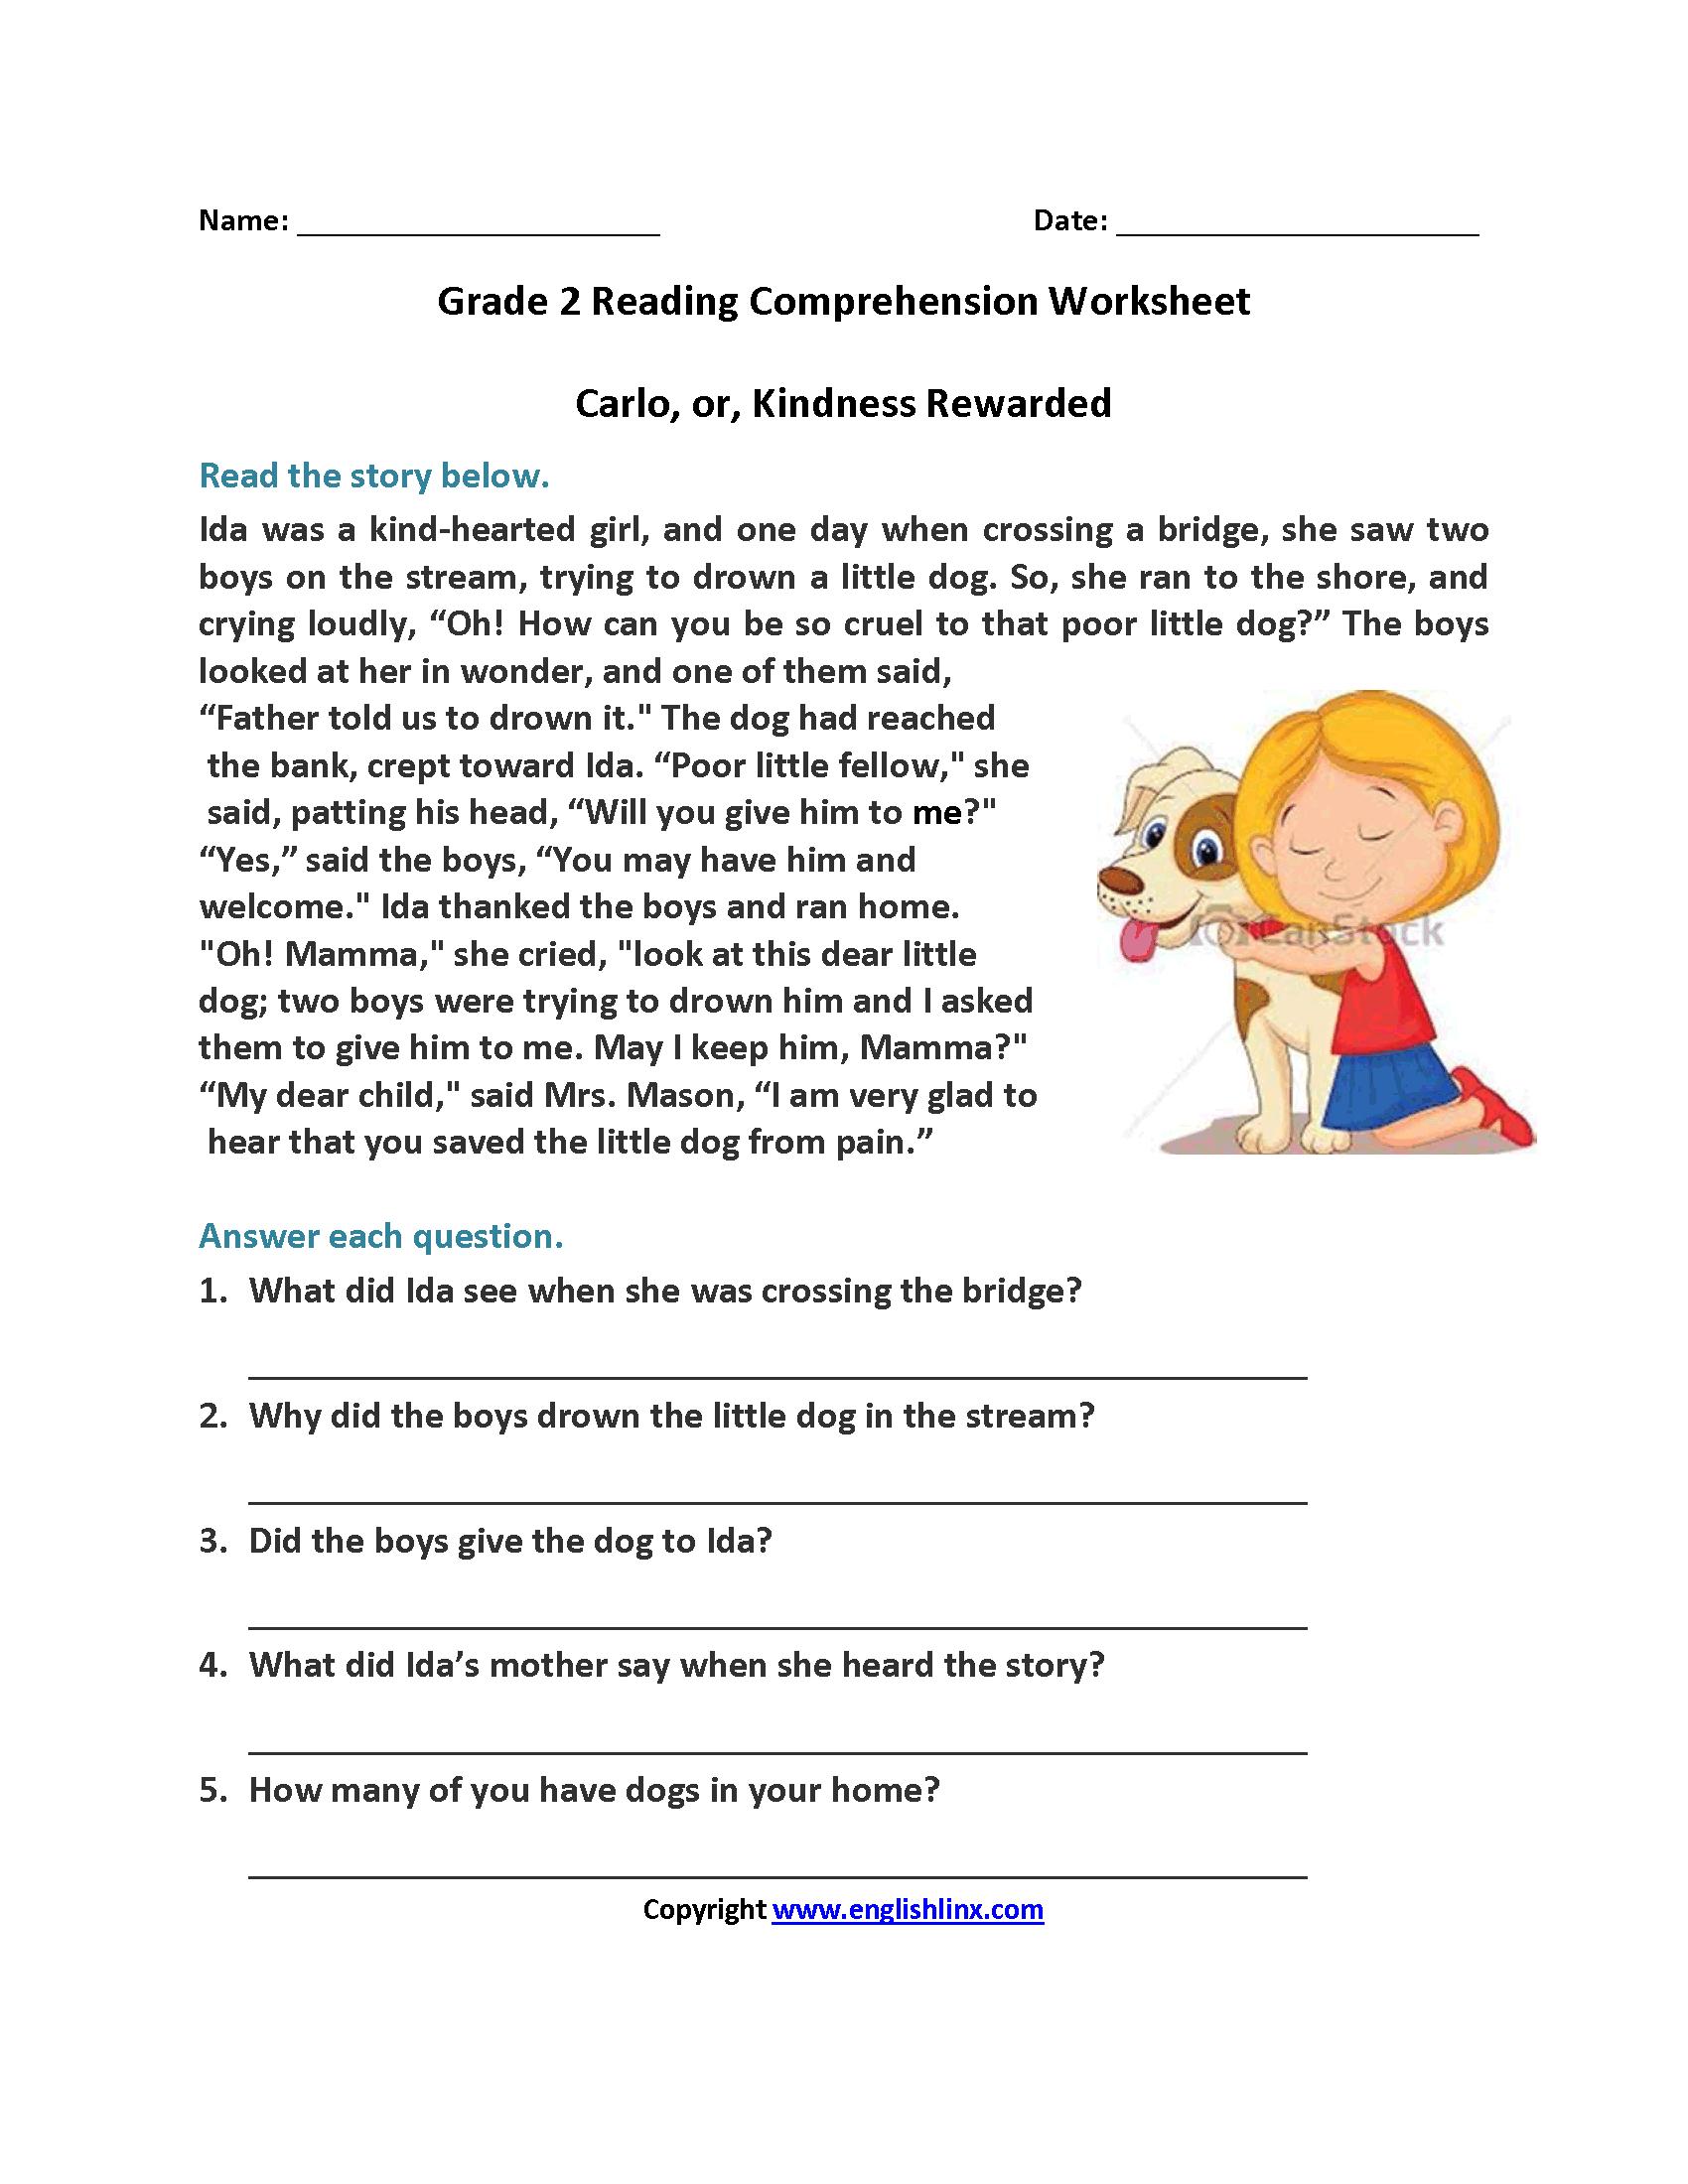 Carlo Or Kindness Rewarded Second Grade Reading Worksheets | Reading | Second Grade Reading Comprehension Printable Worksheets